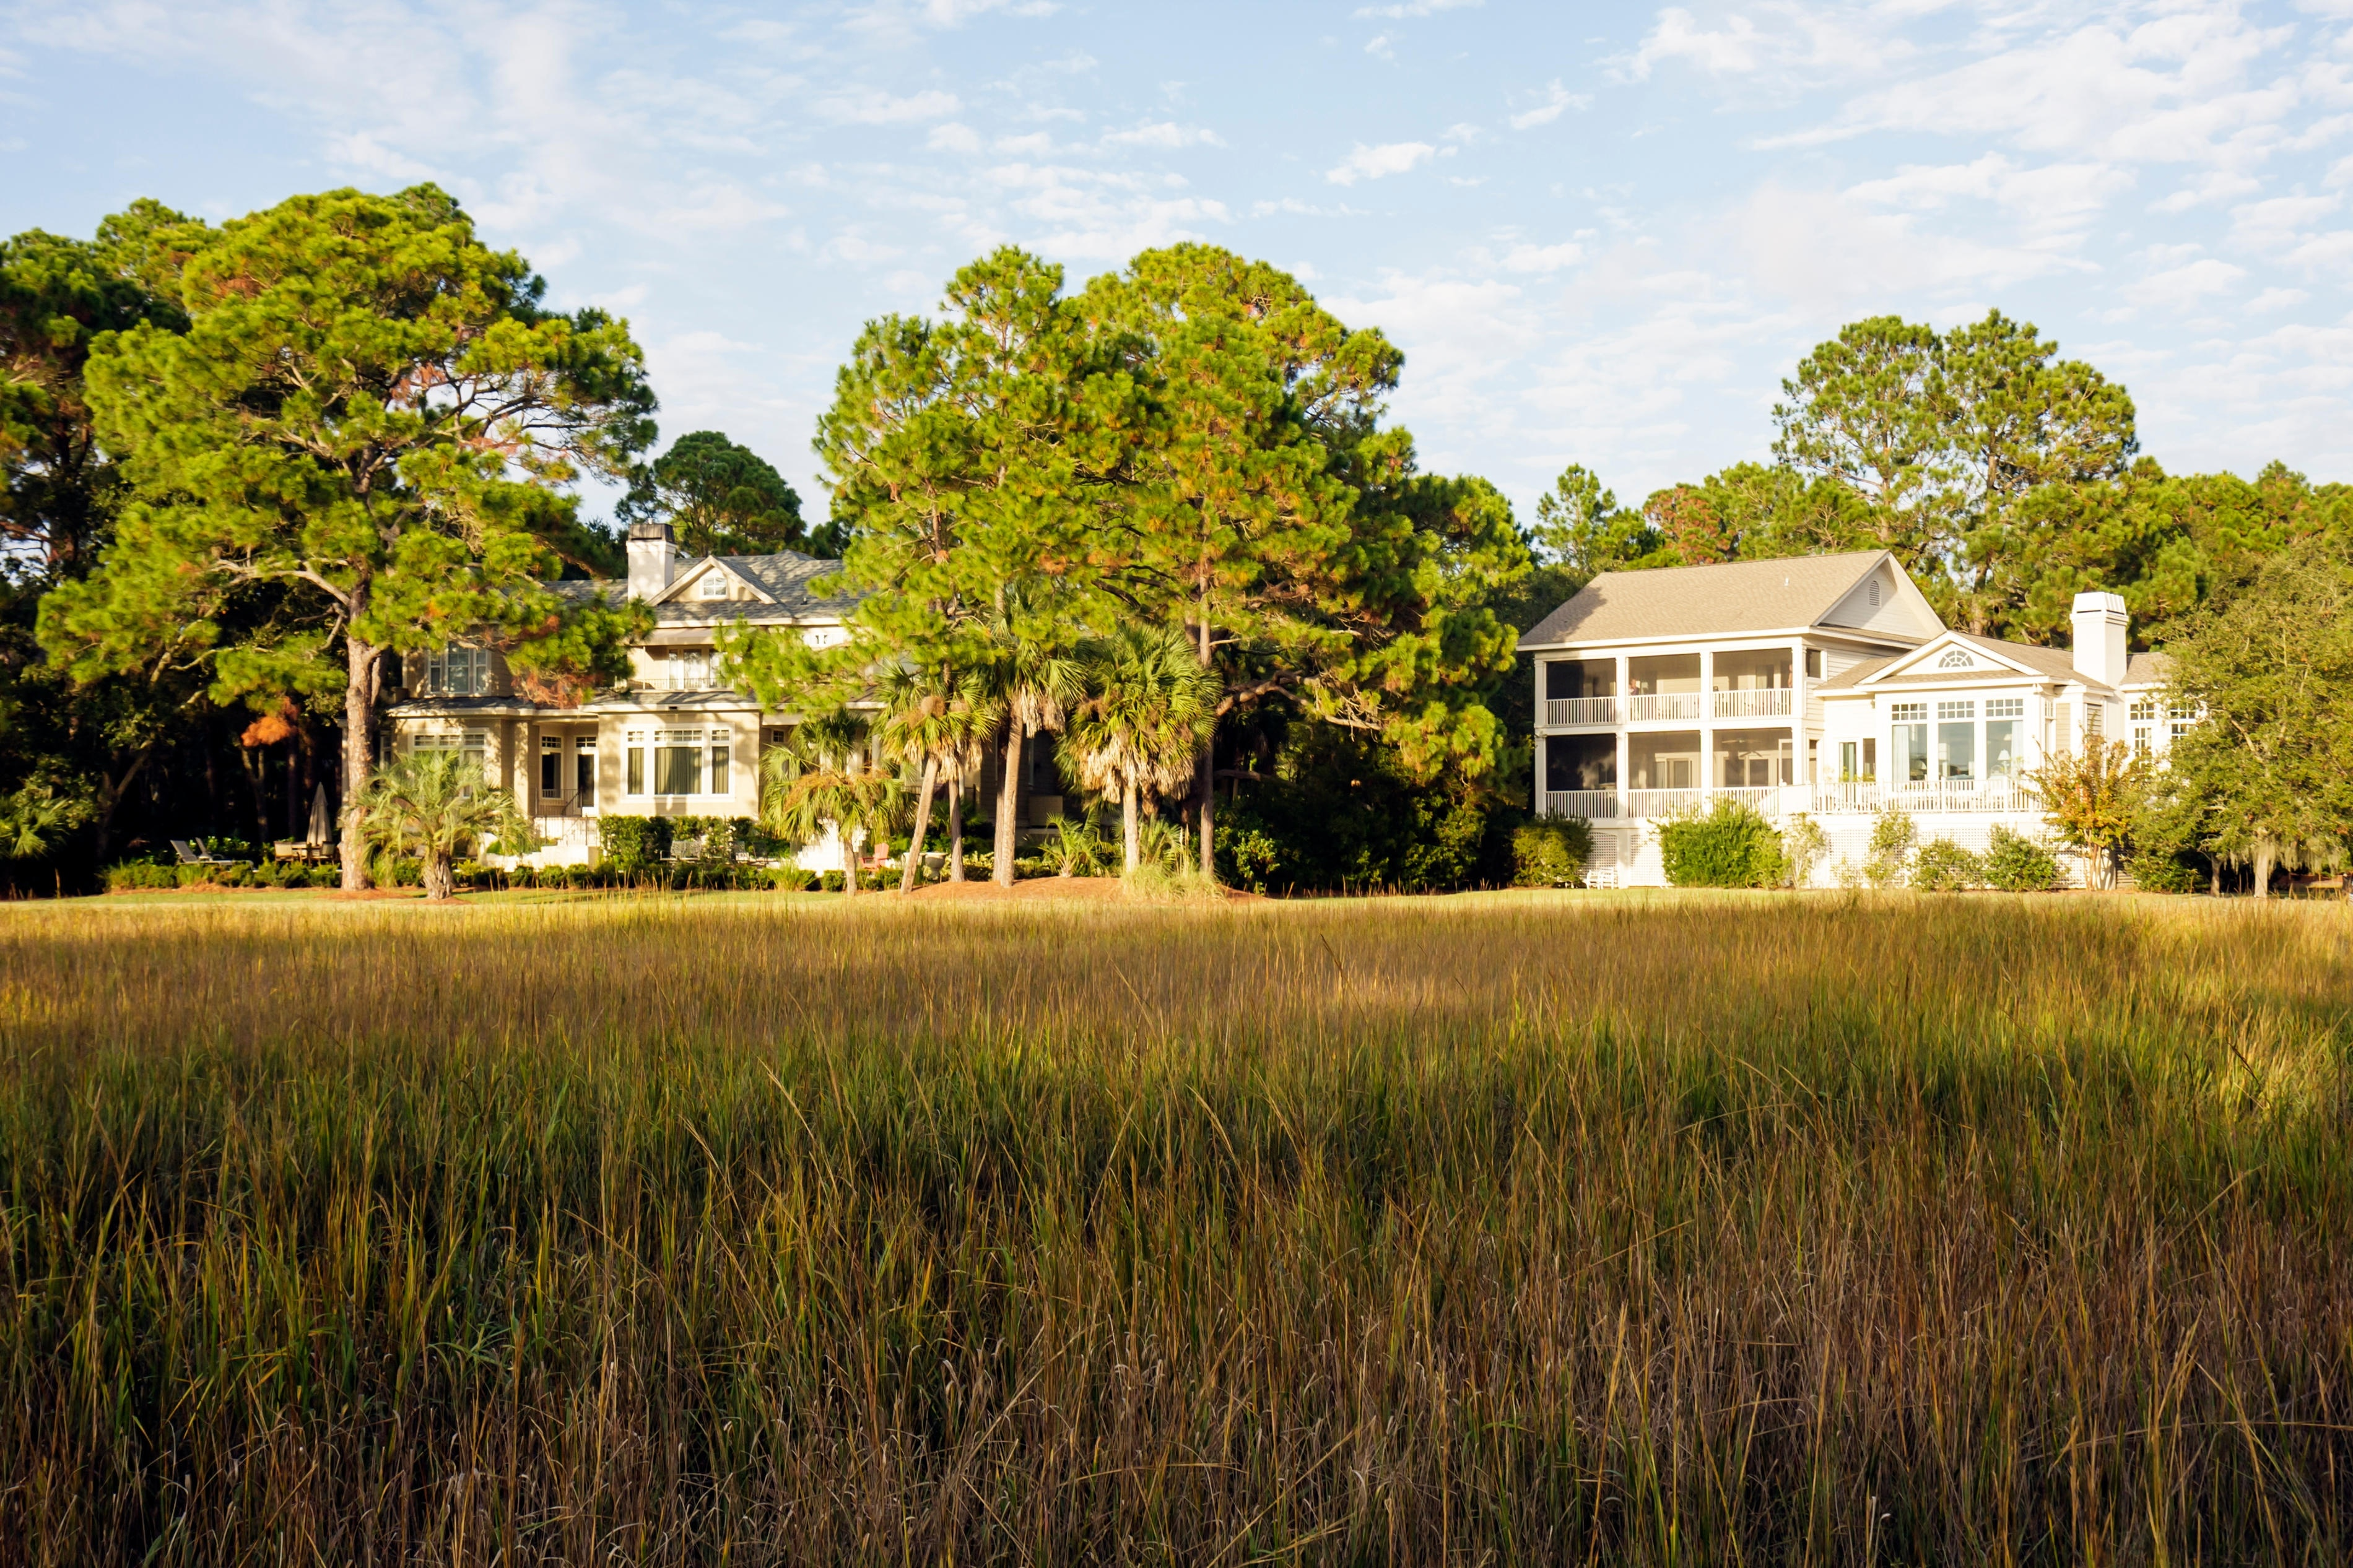 Sea Pines Forest Preserve, Hilton Head Island, South Carolina, United States of America